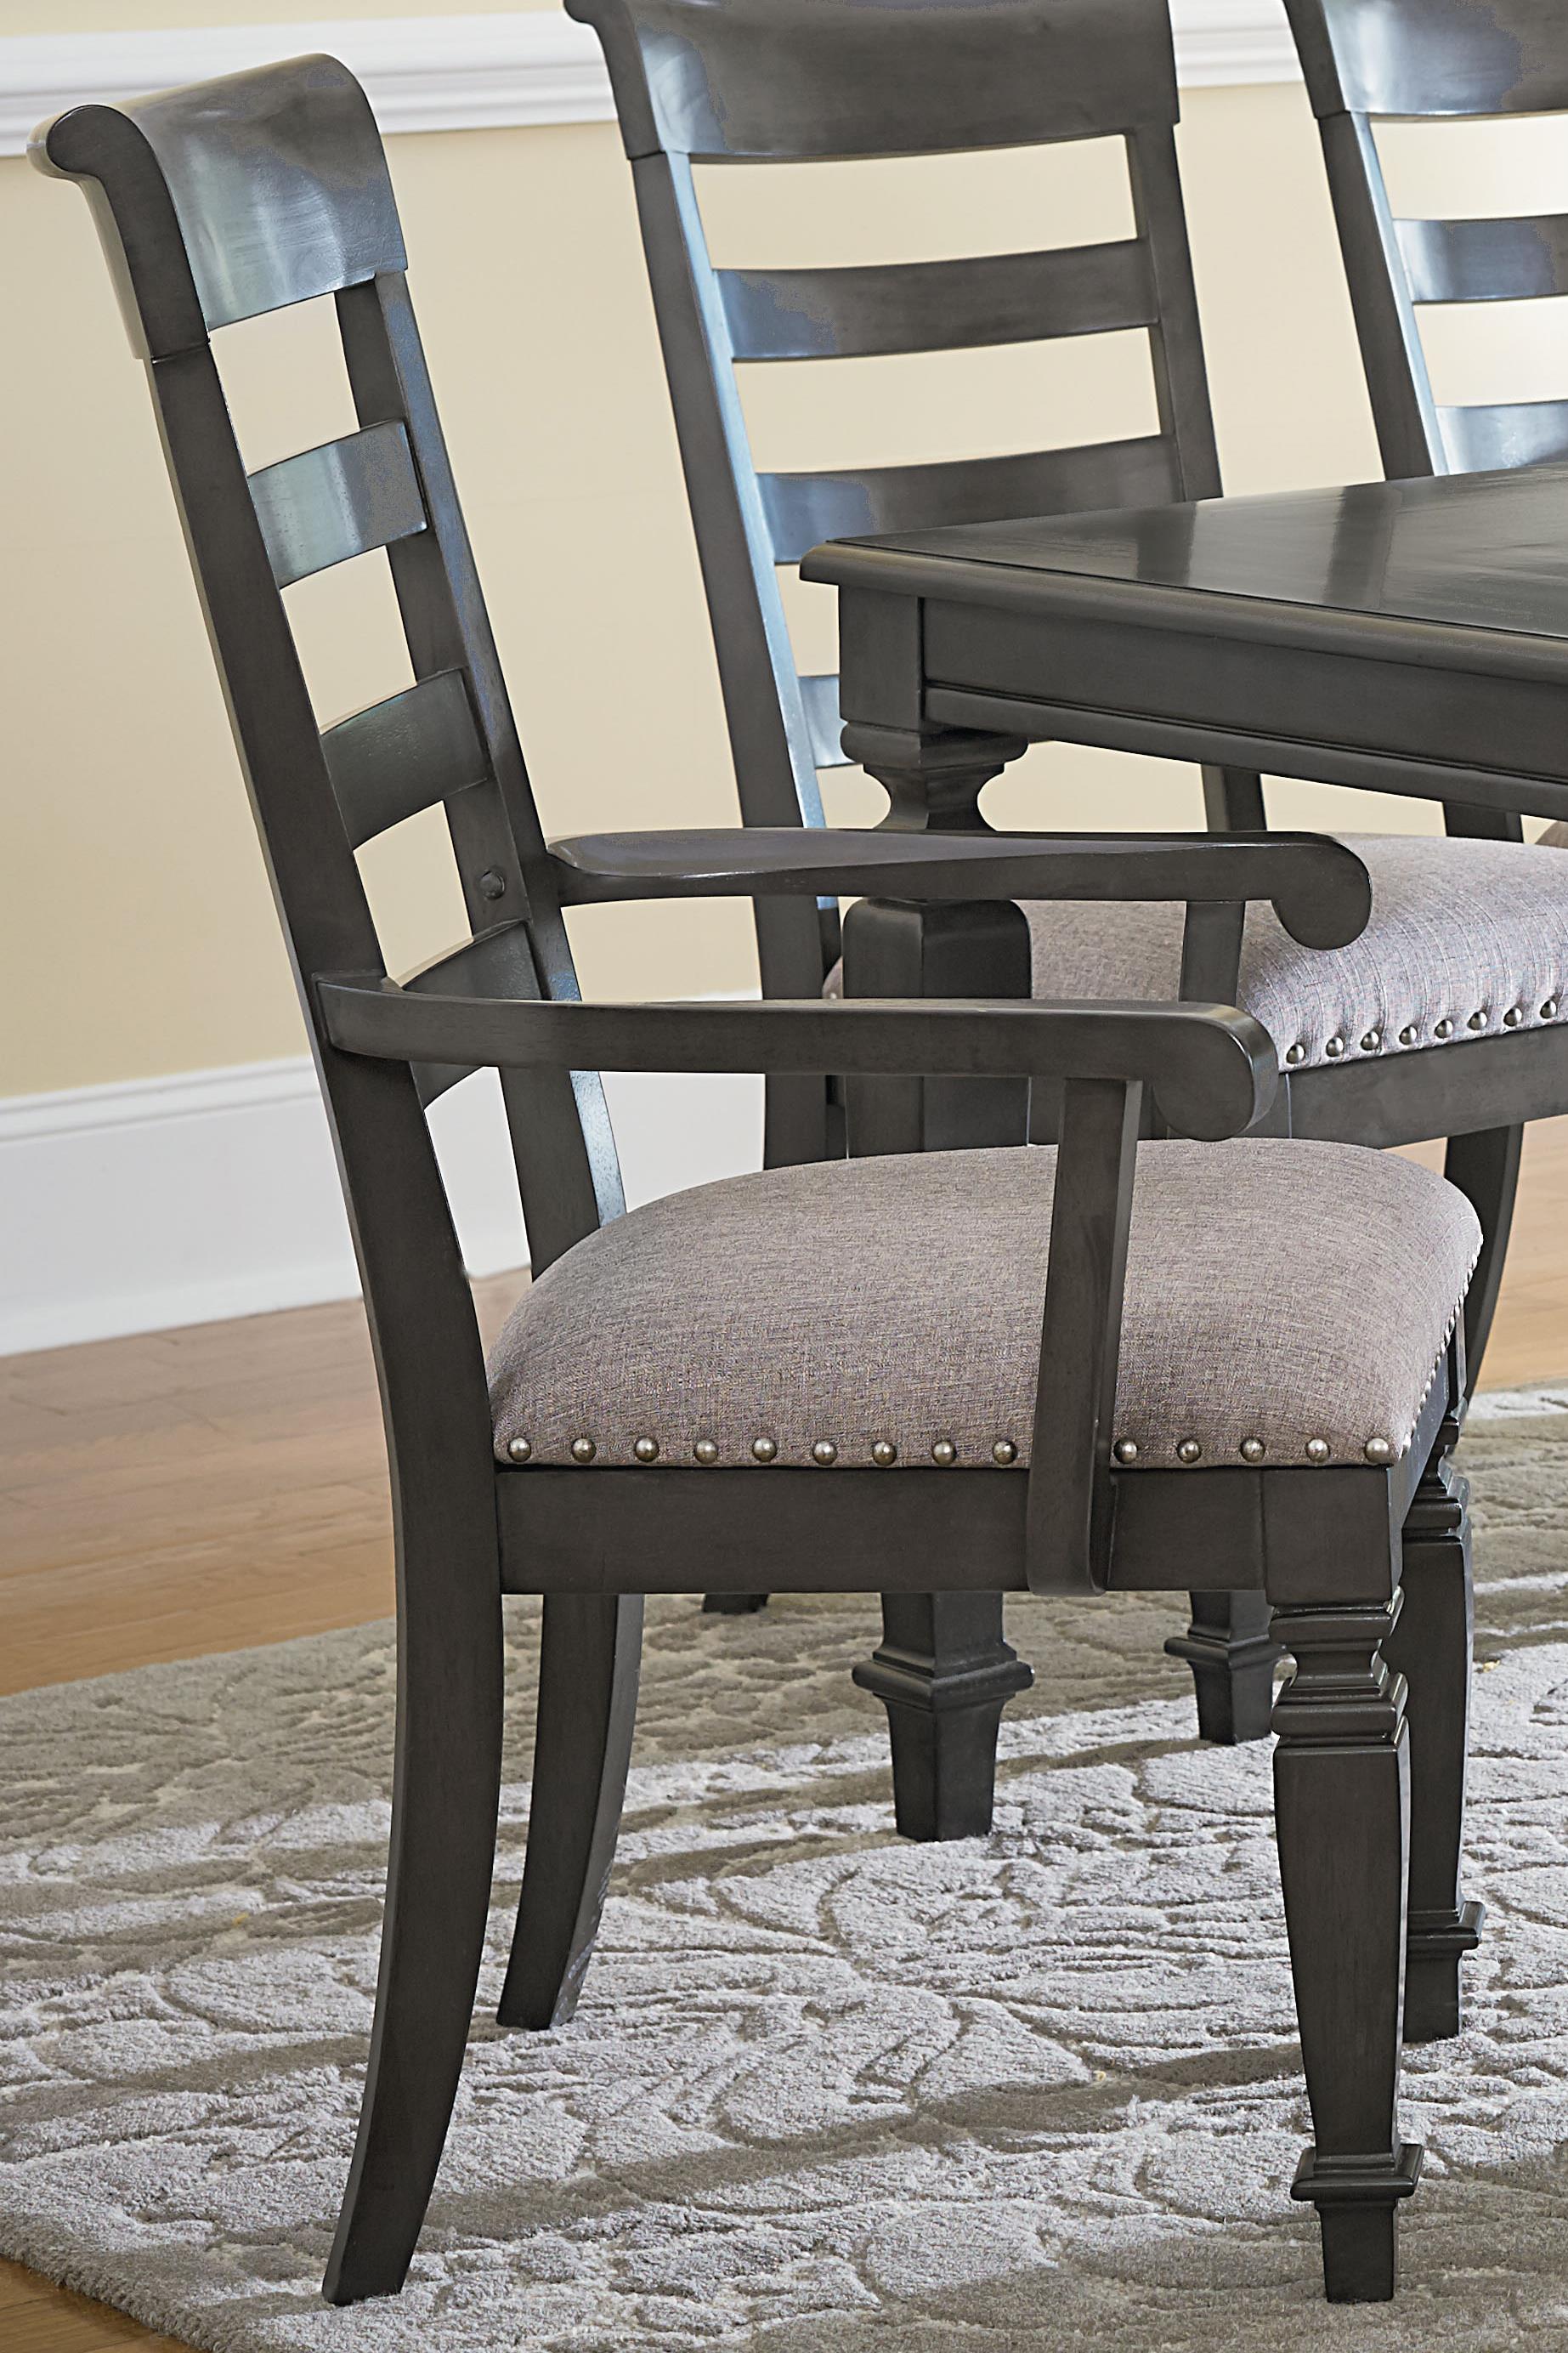 Garrison (14900) By Standard Furniture   Wayside Furniture   Standard Furniture  Garrison Dealer